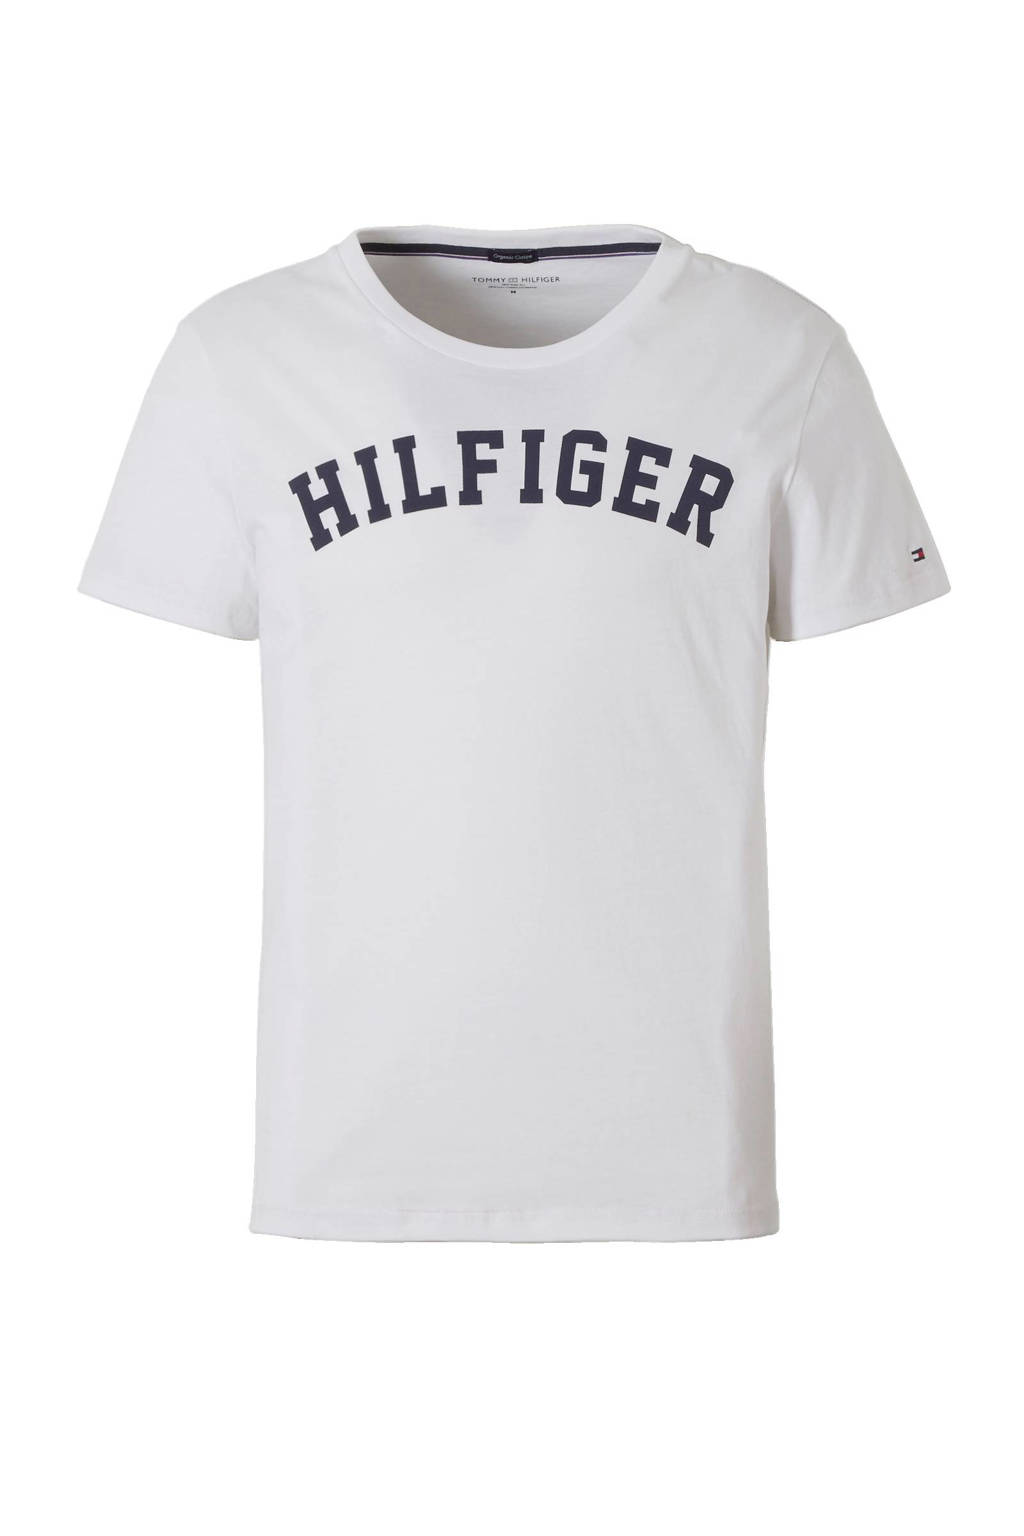 Tommy Hilfiger T-shirt, Wit/zwart